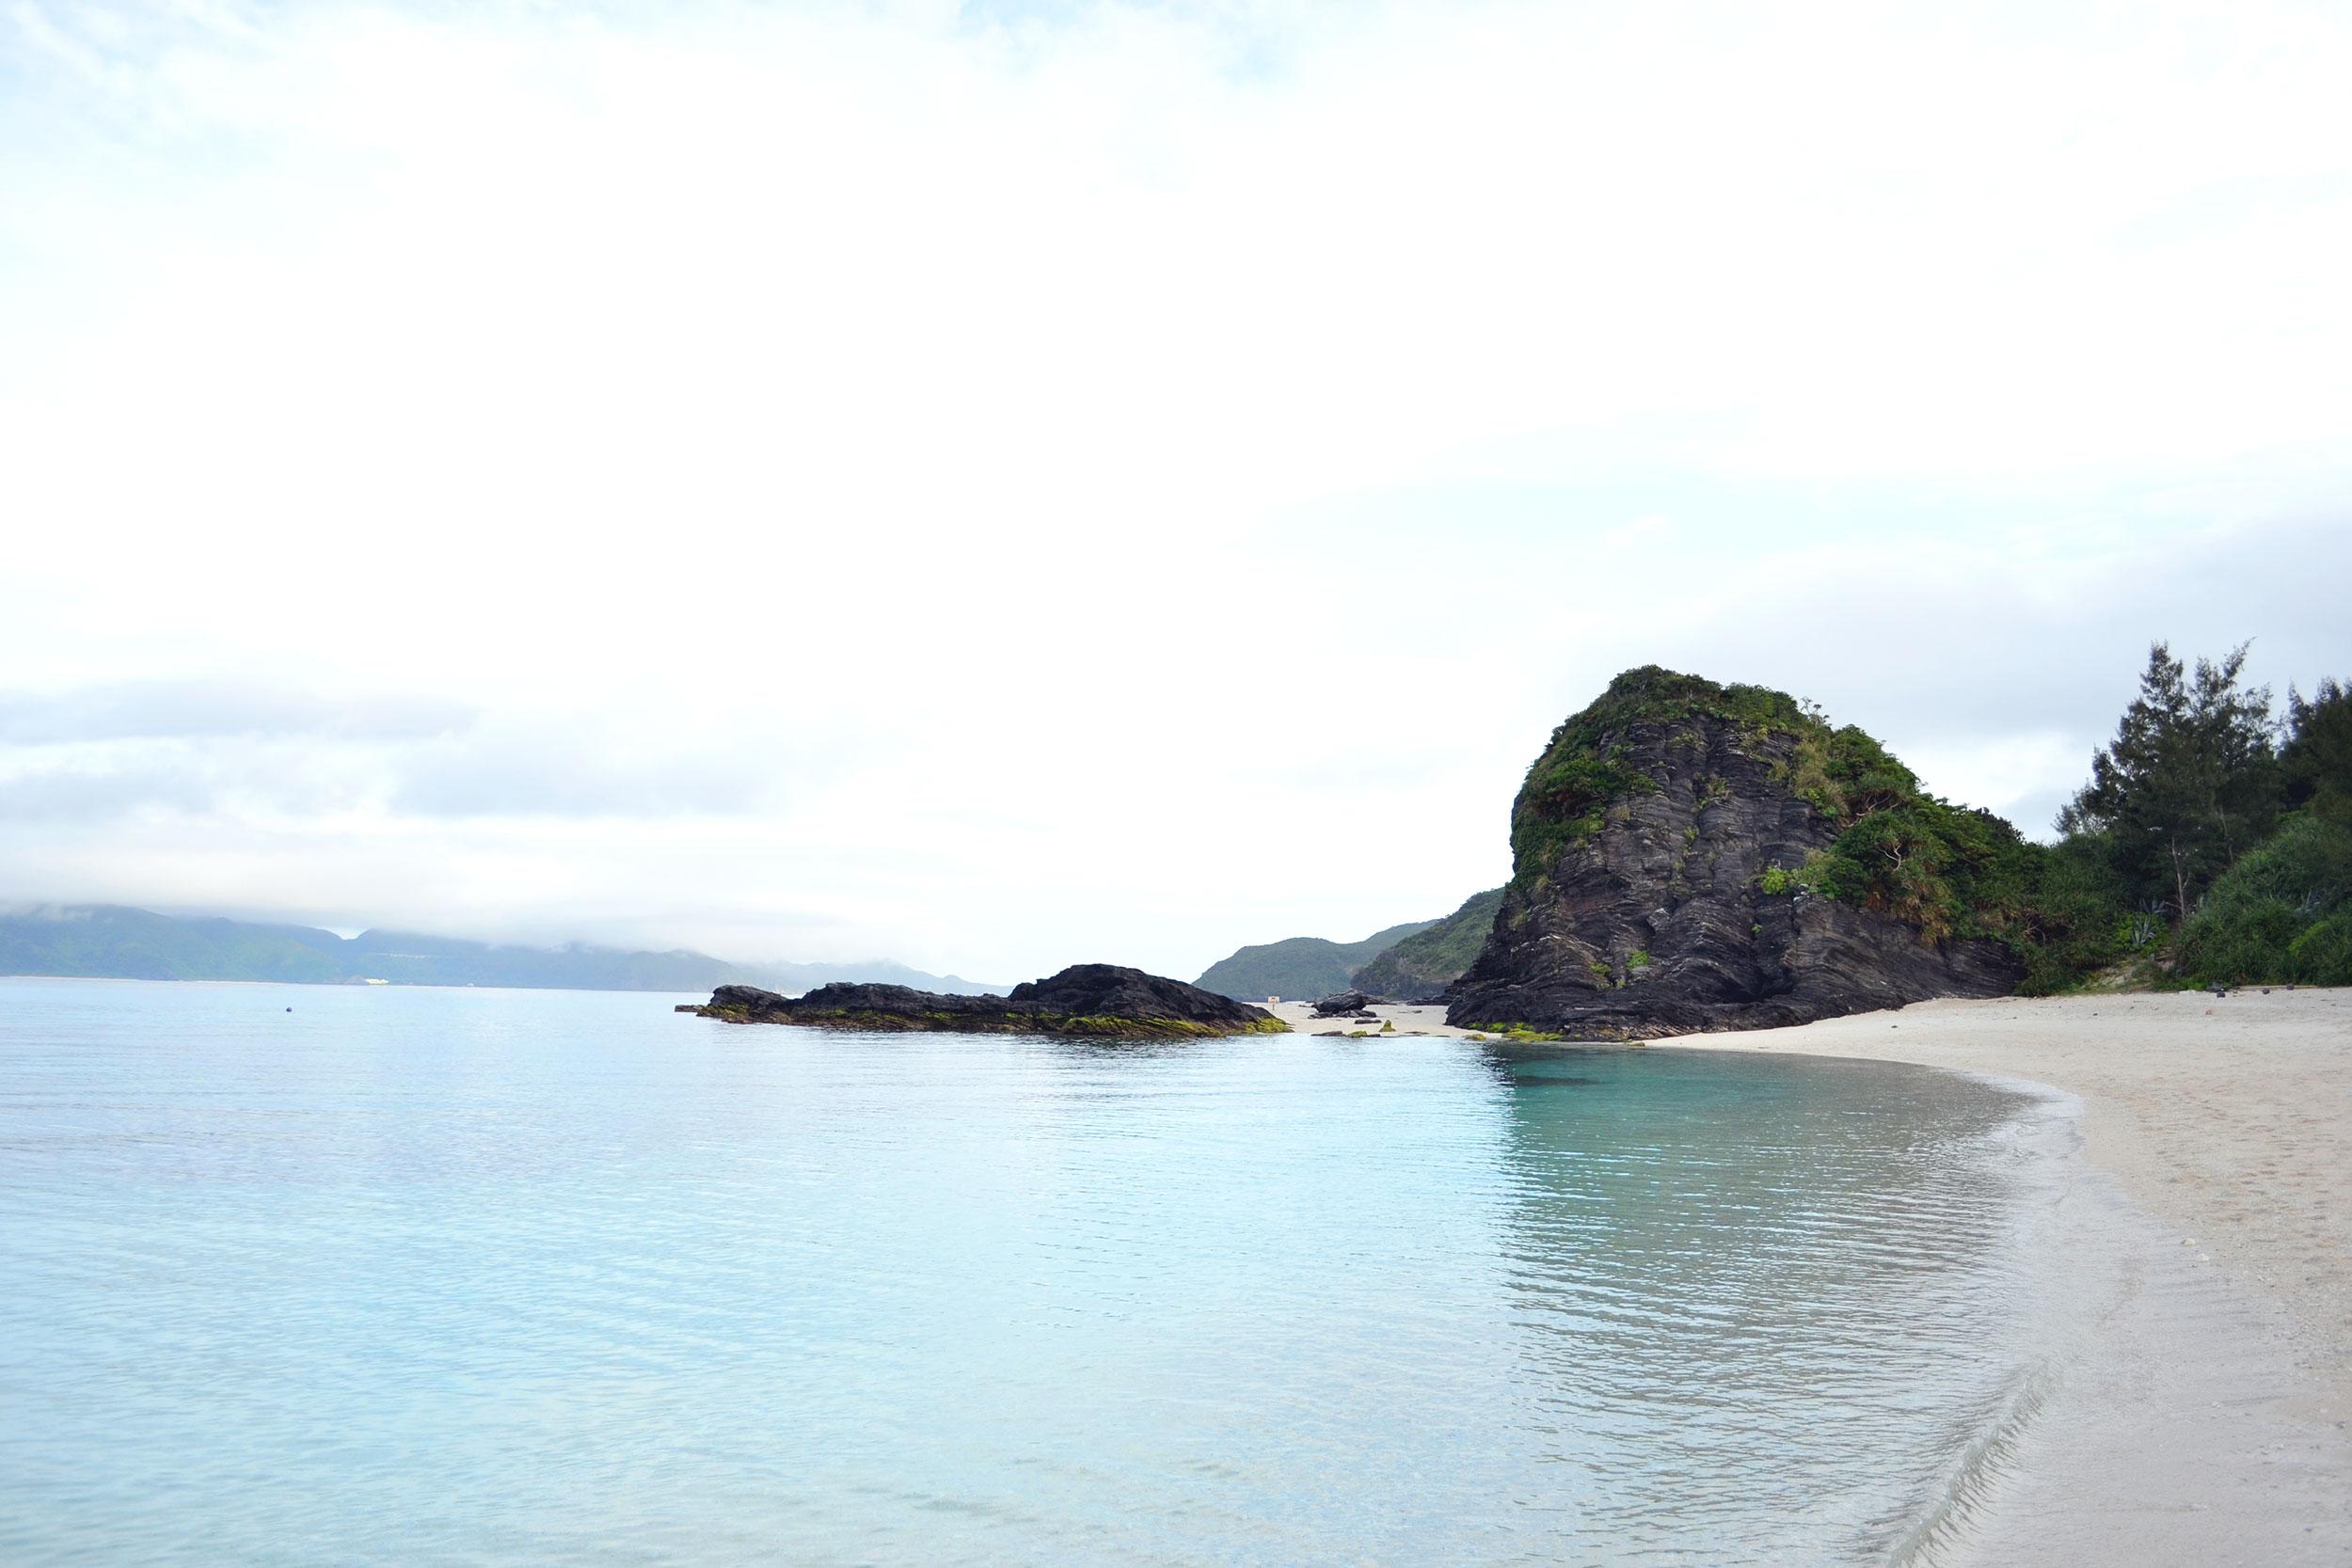 Zamami island, Okinawa